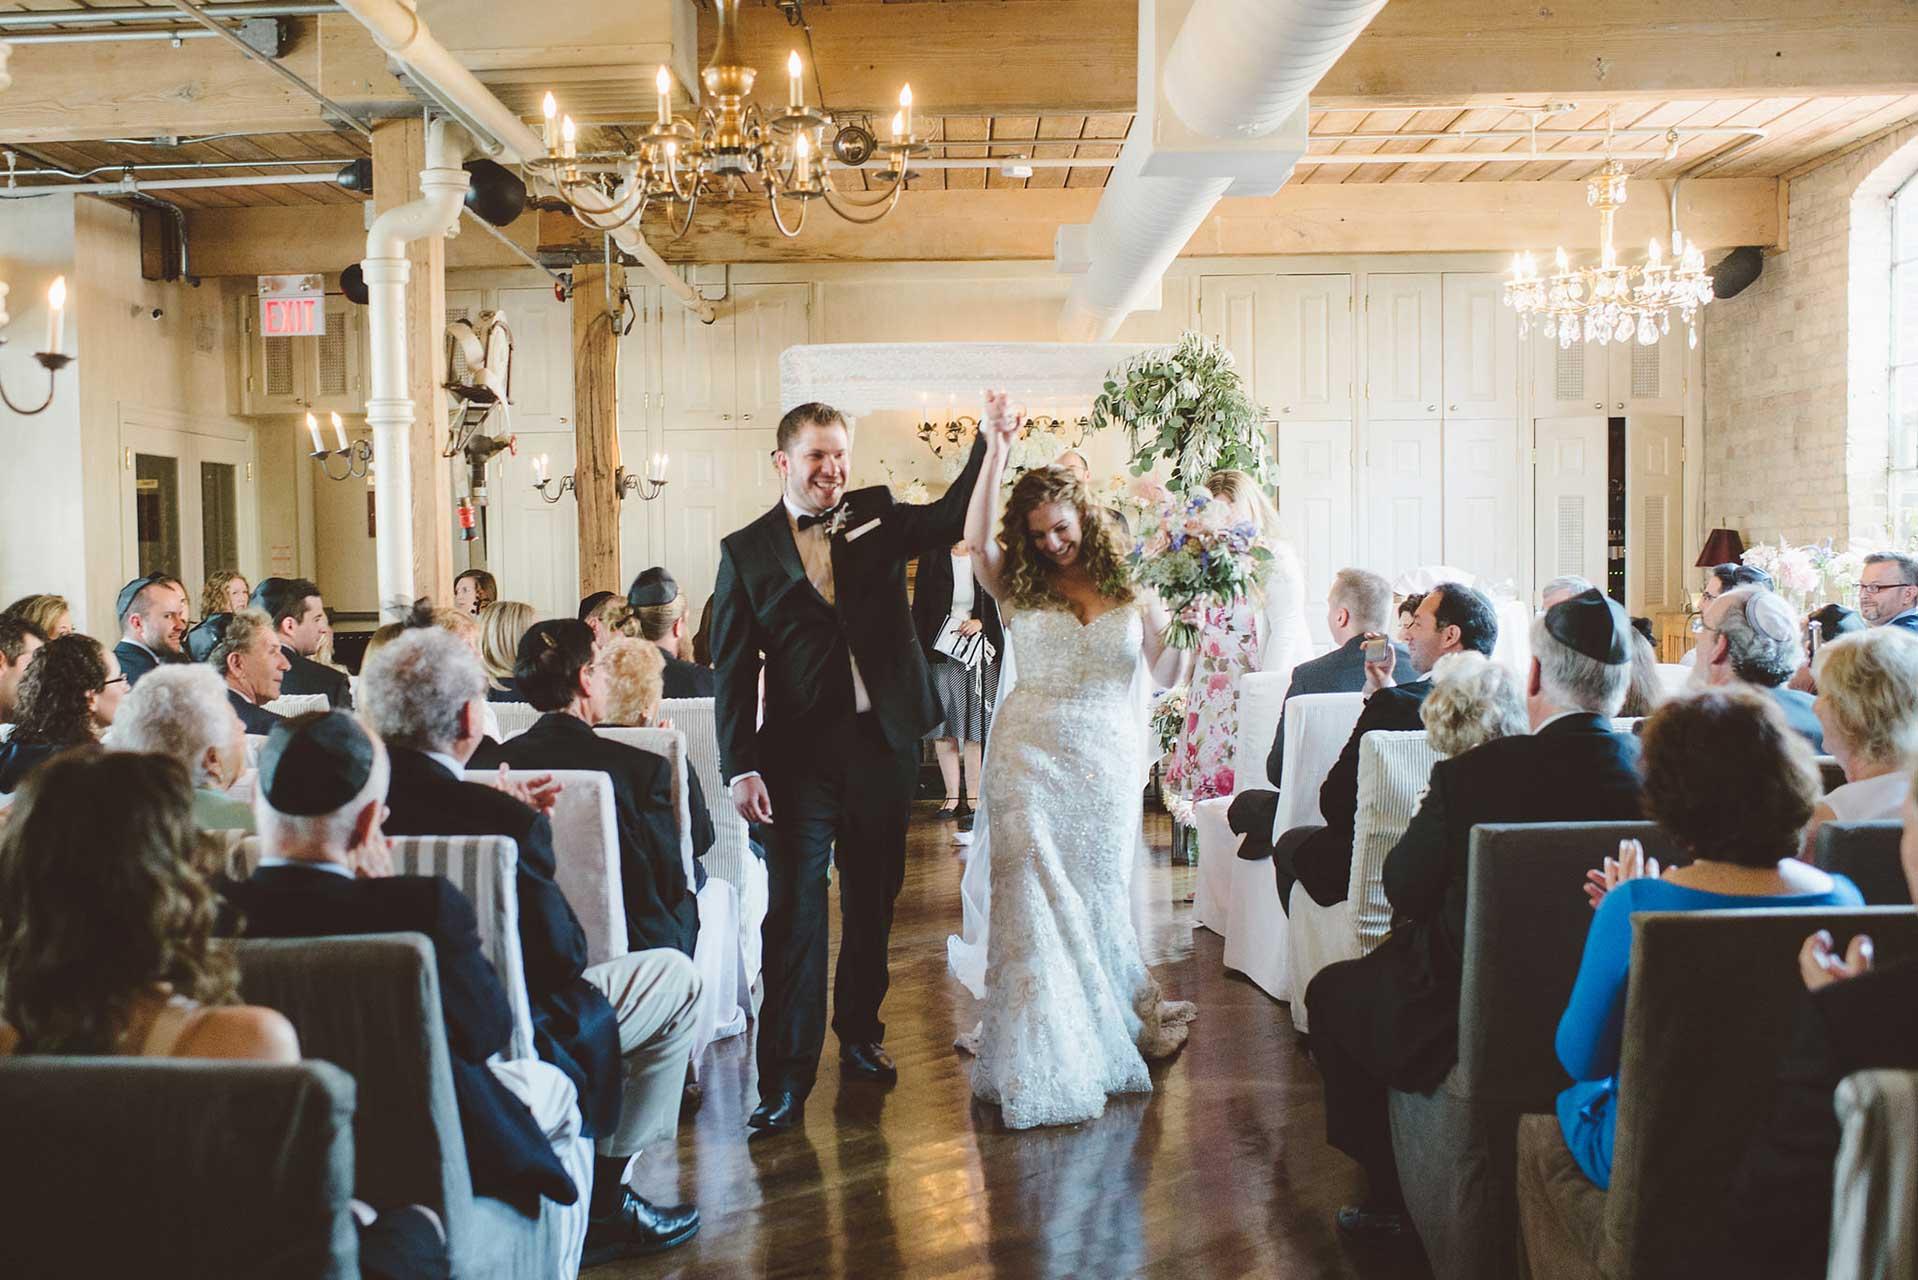 Toronto Wedding Venue - Traditional Jewish Wedding Ceremony - Chuppah